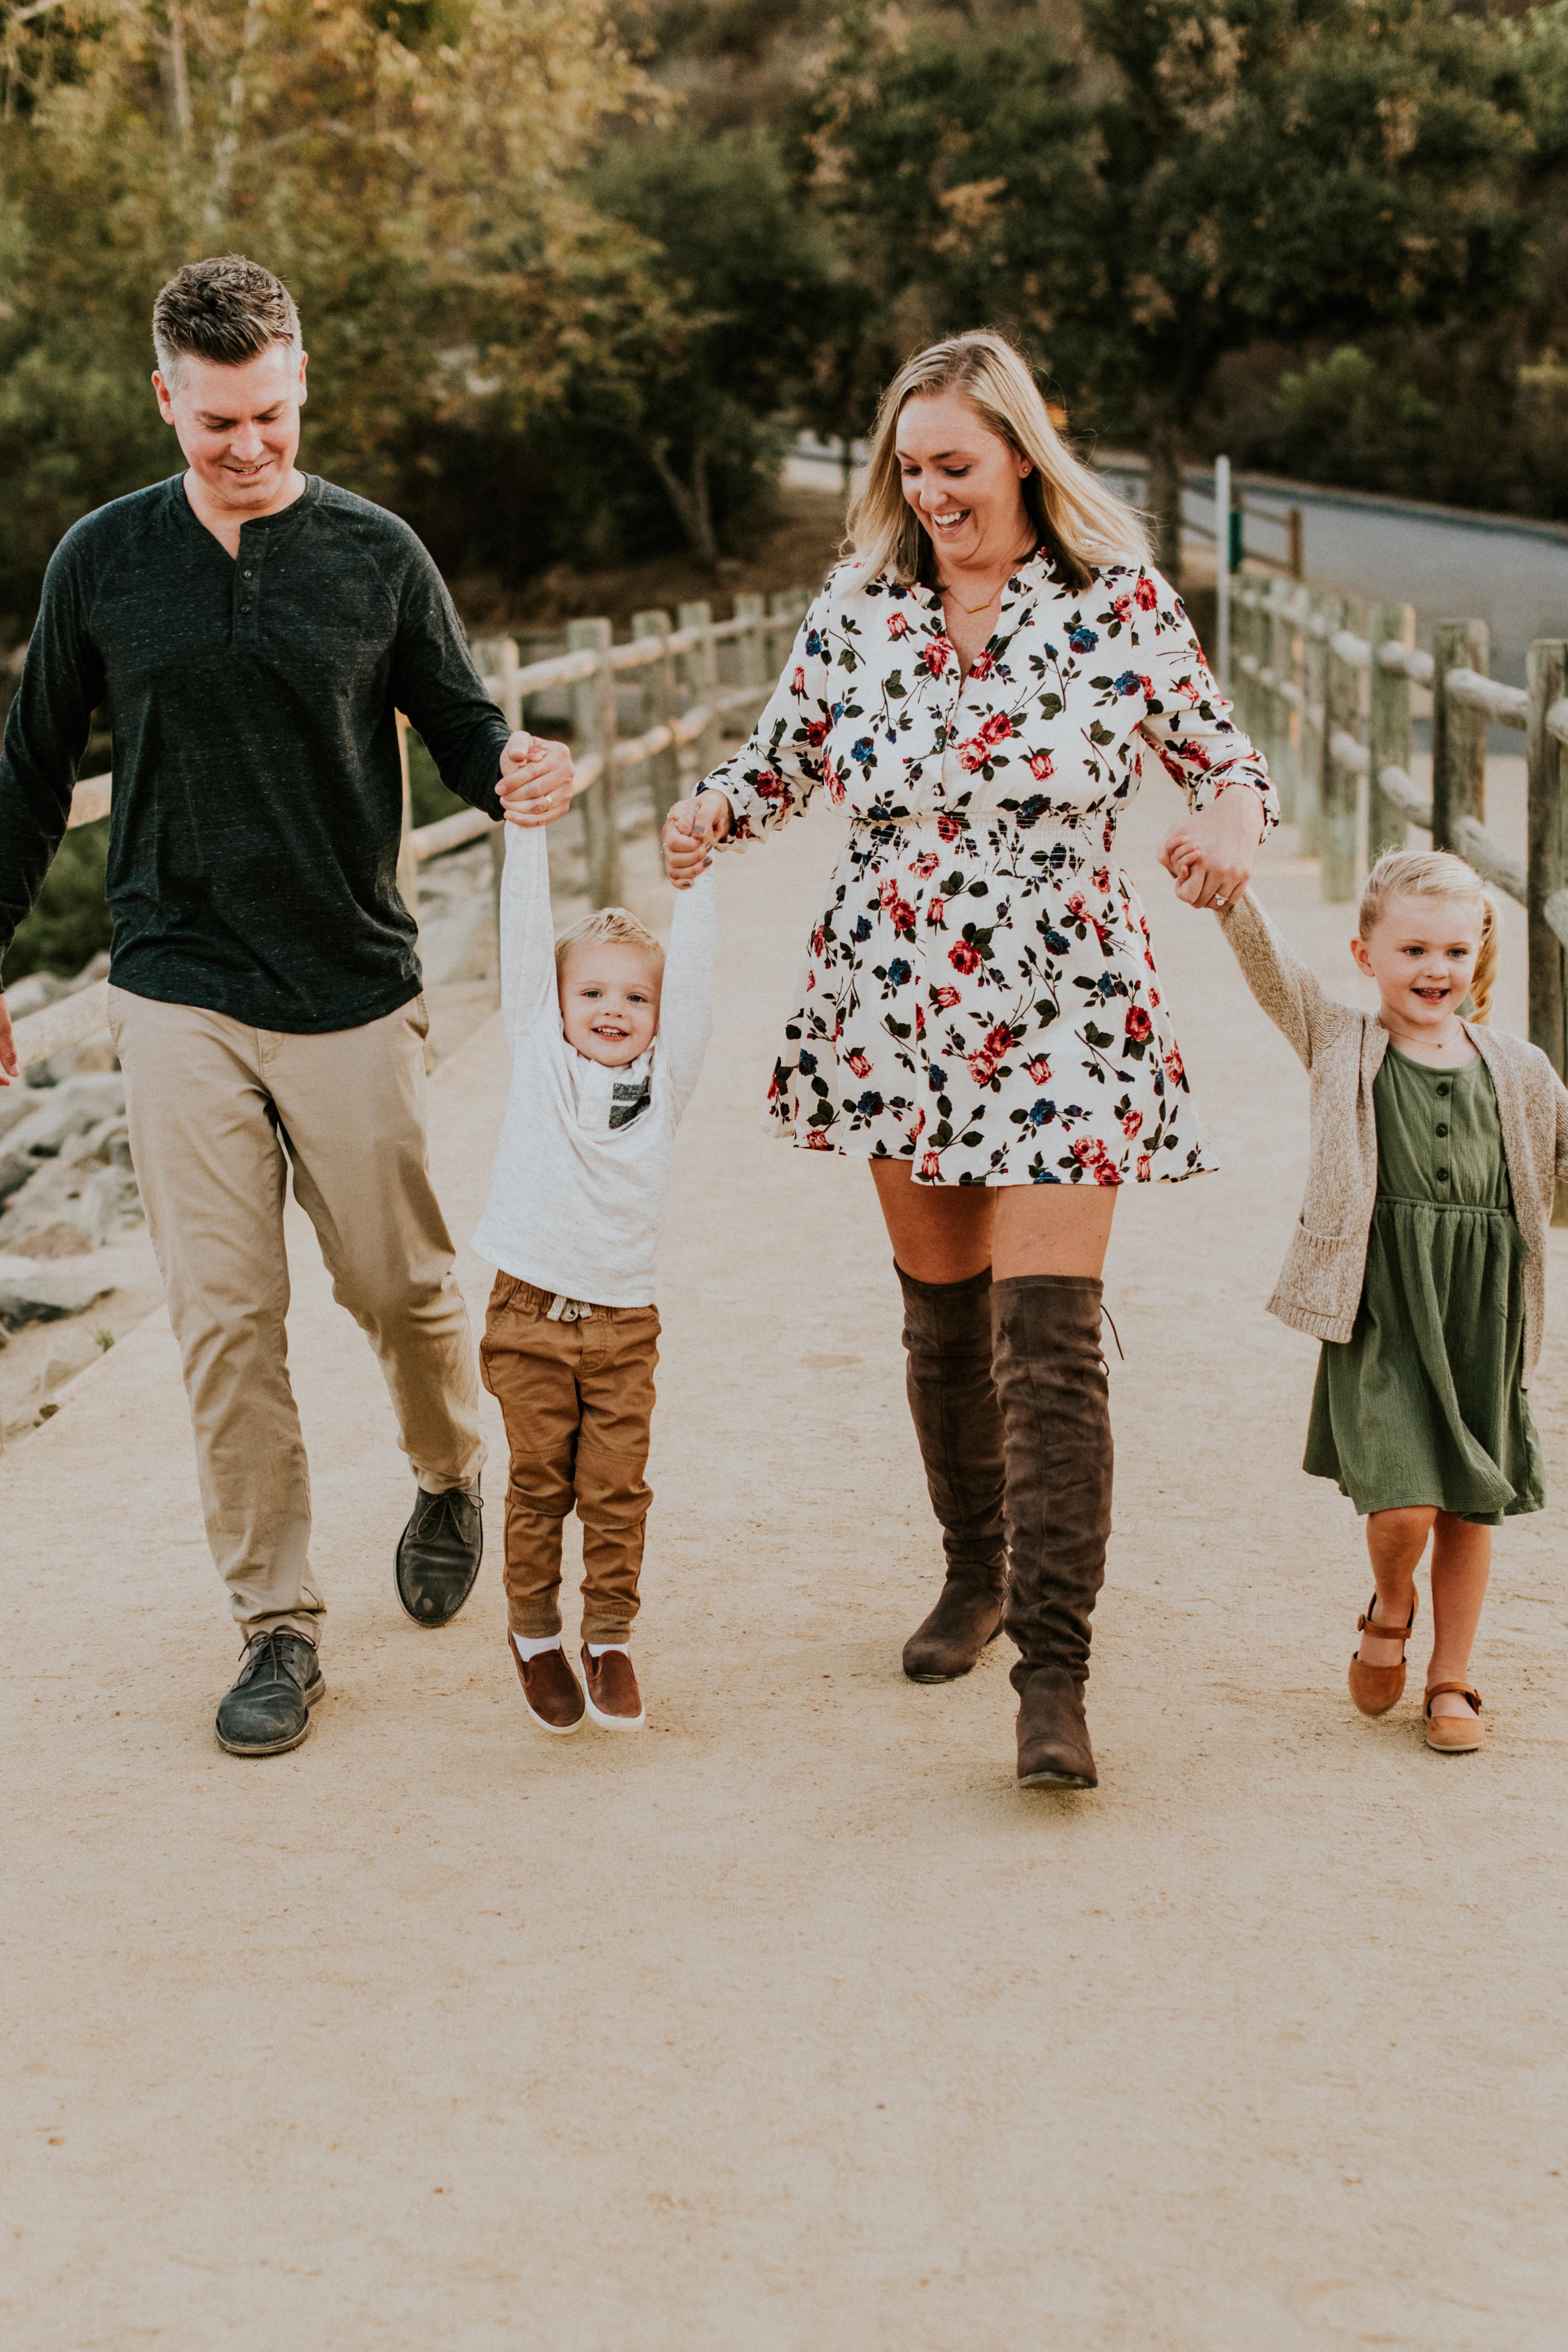 family walking holding hands fall photos family photography los angeles california